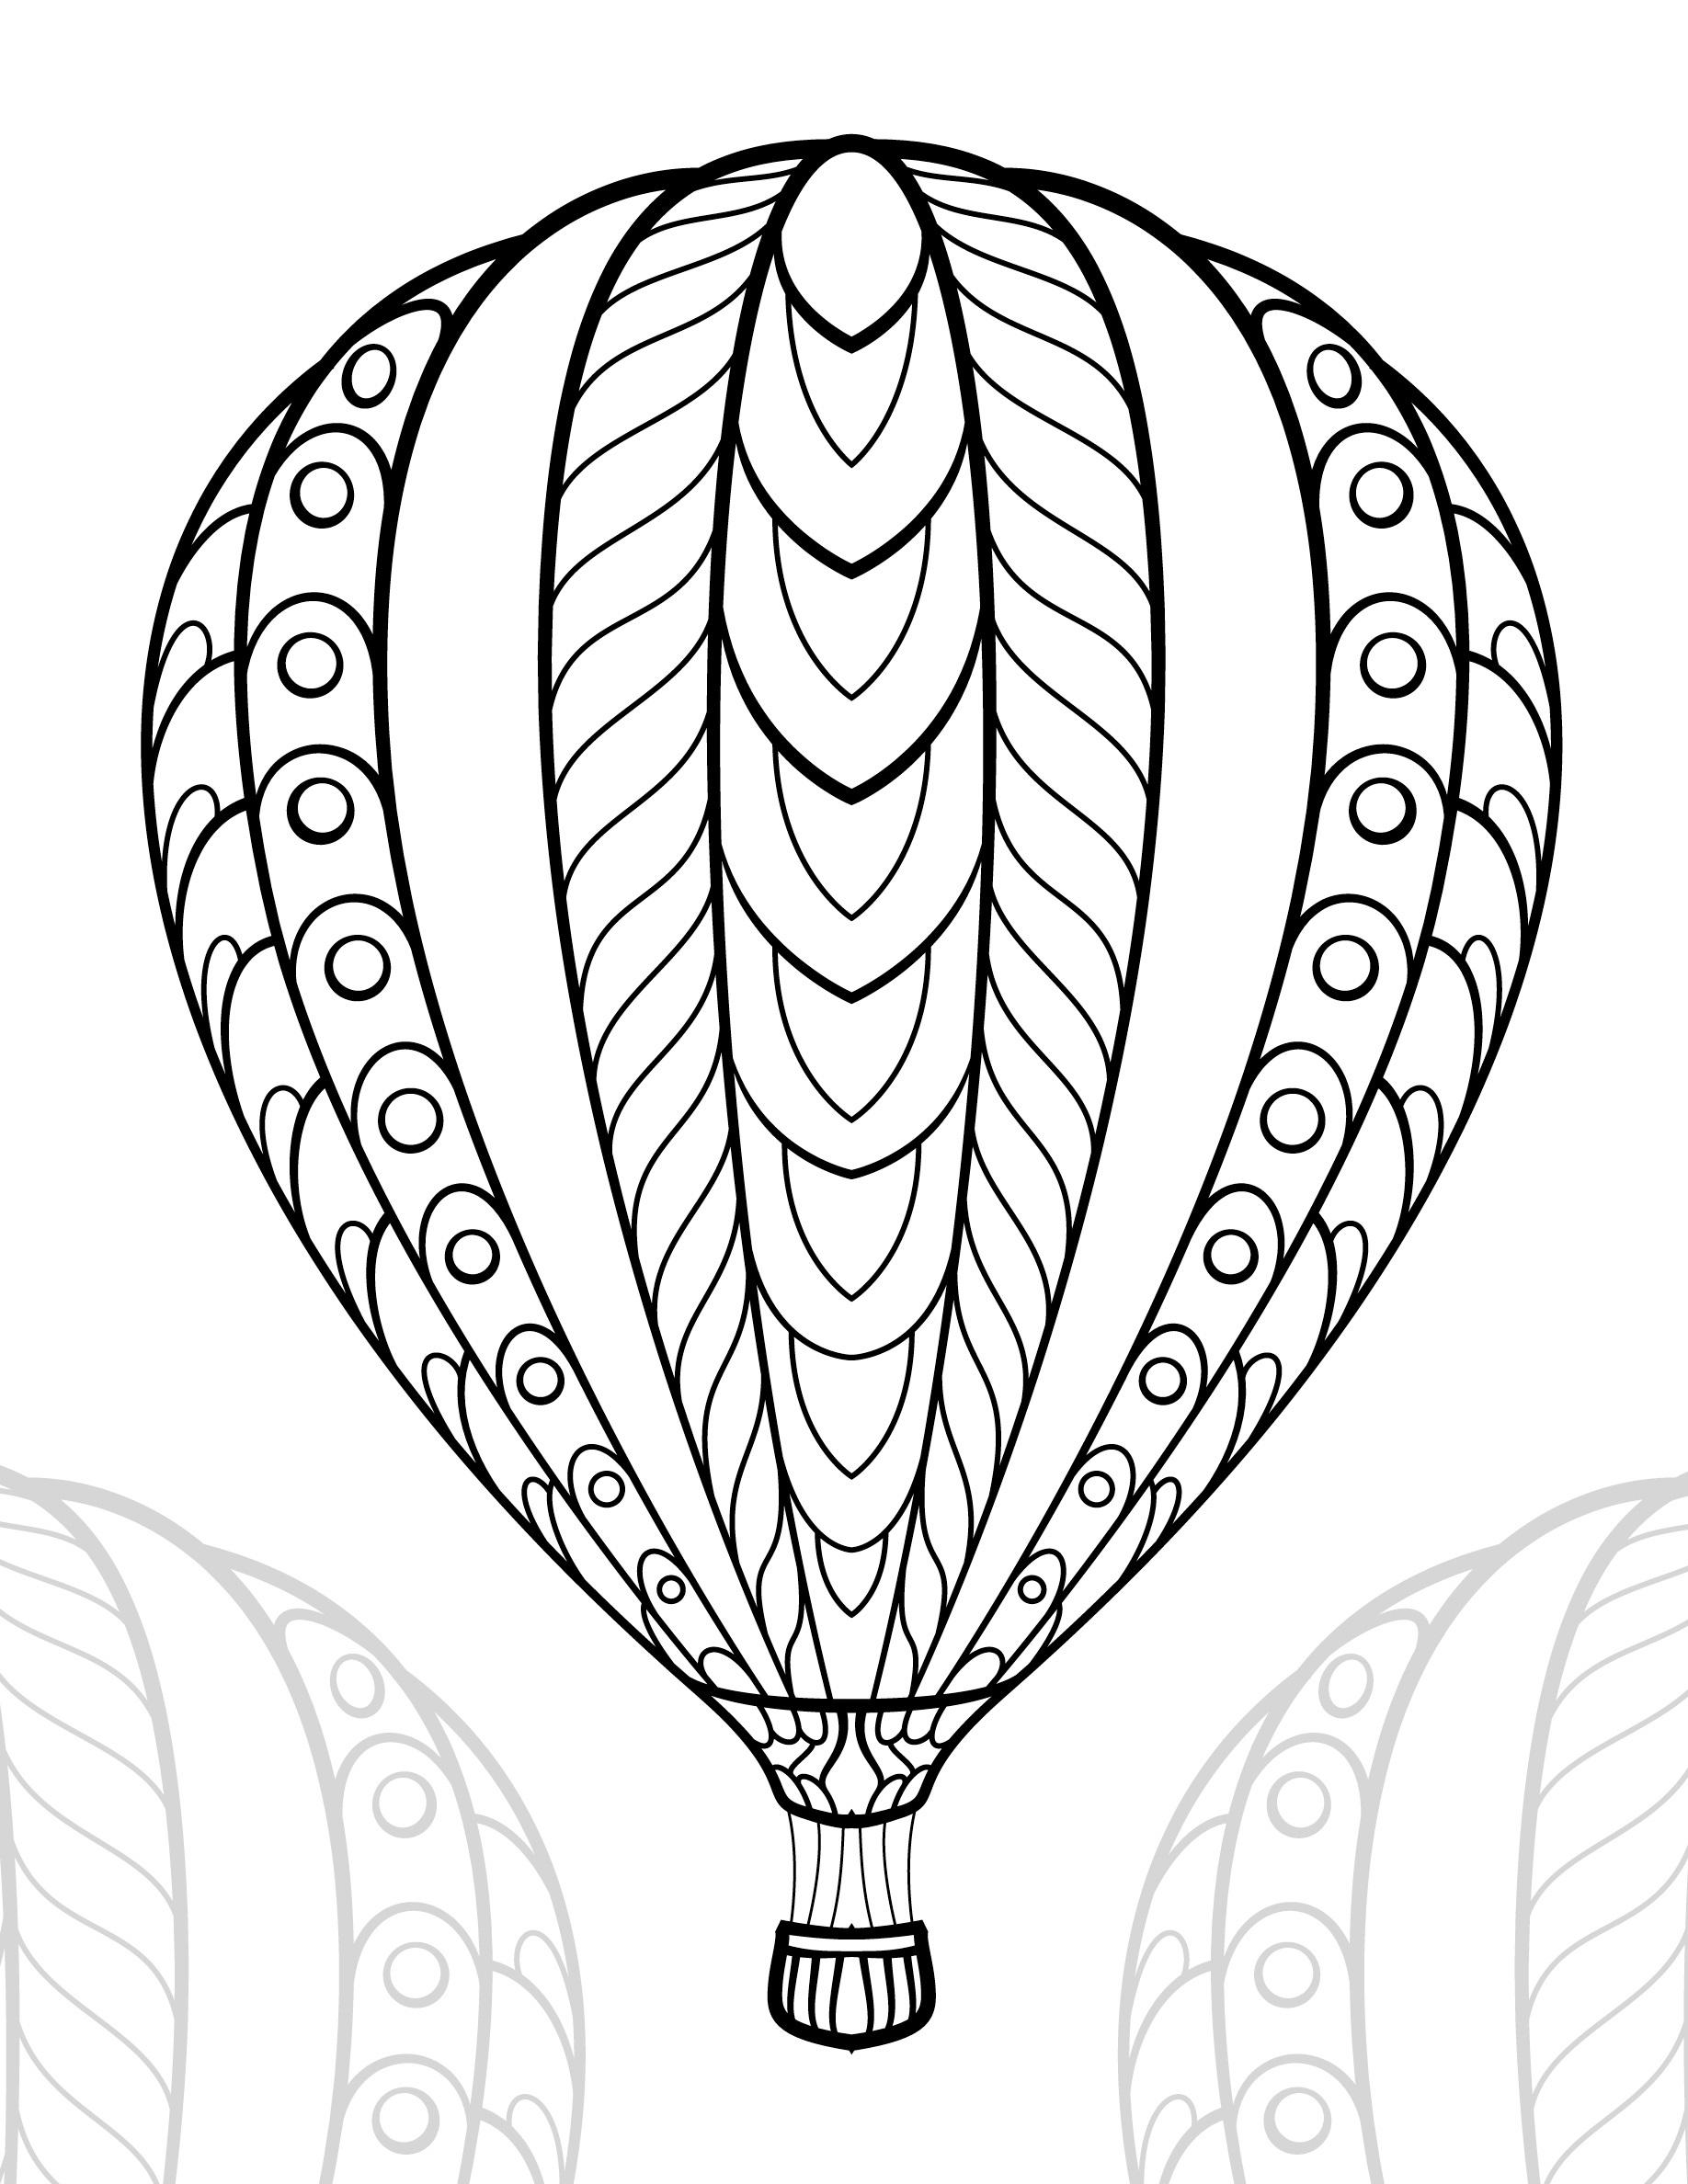 hot-air-balloon-entertain-coloring-page